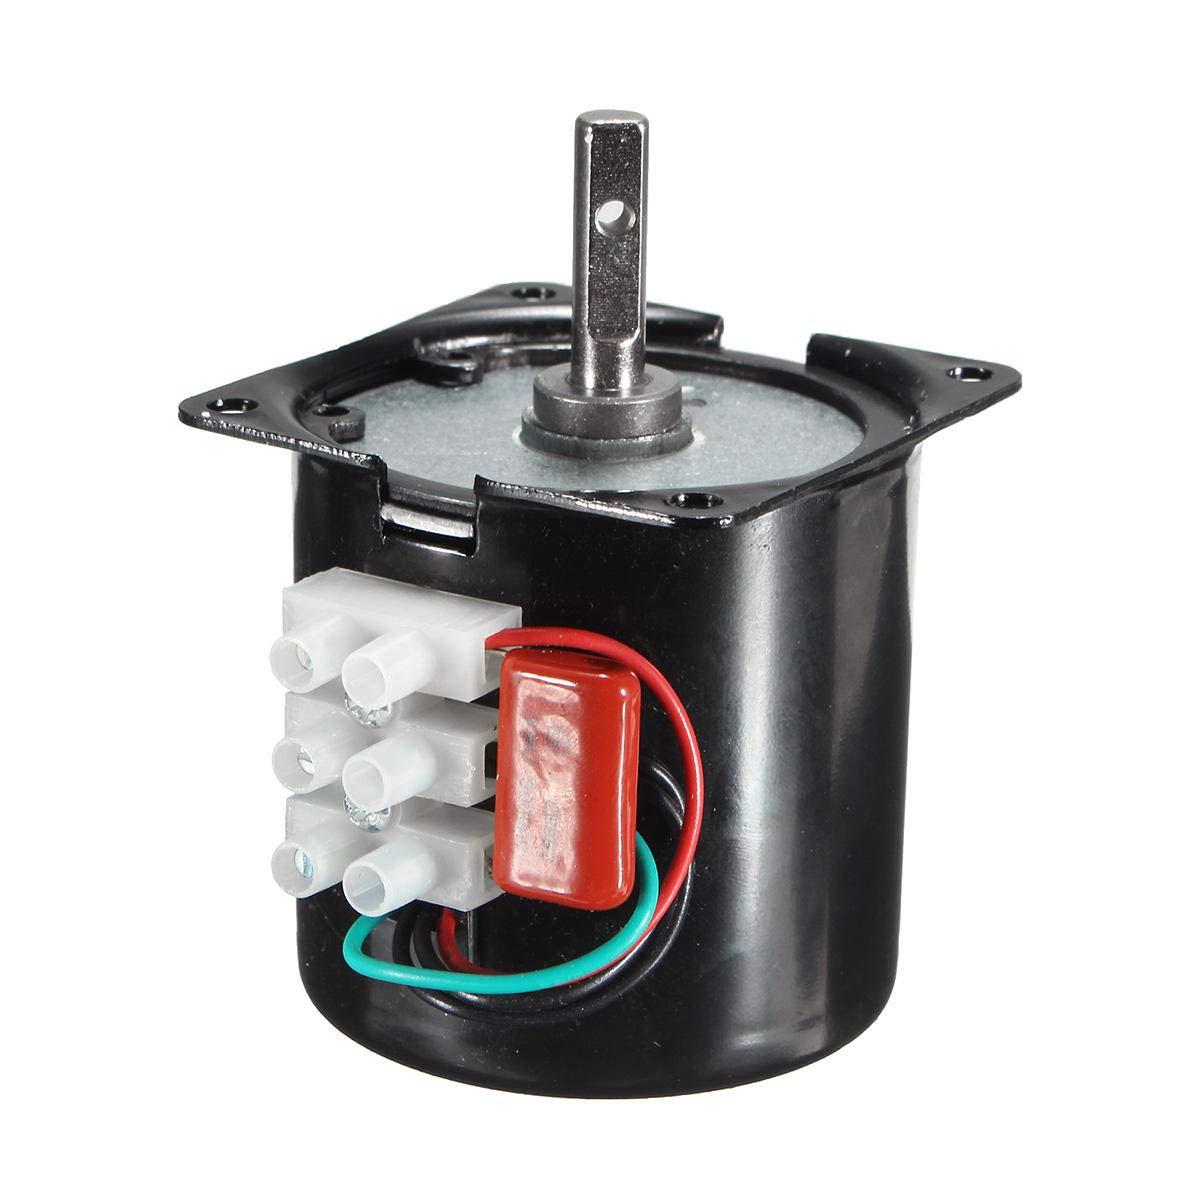 60KTYZ 220V 14W Permanent Synchronous Motor Machine 50Hz 110R/min - Arduino Compatible SCM & DIY Kits Smart Robot & Solar Panel - 1 x 60KTYZ Synchronous Motor